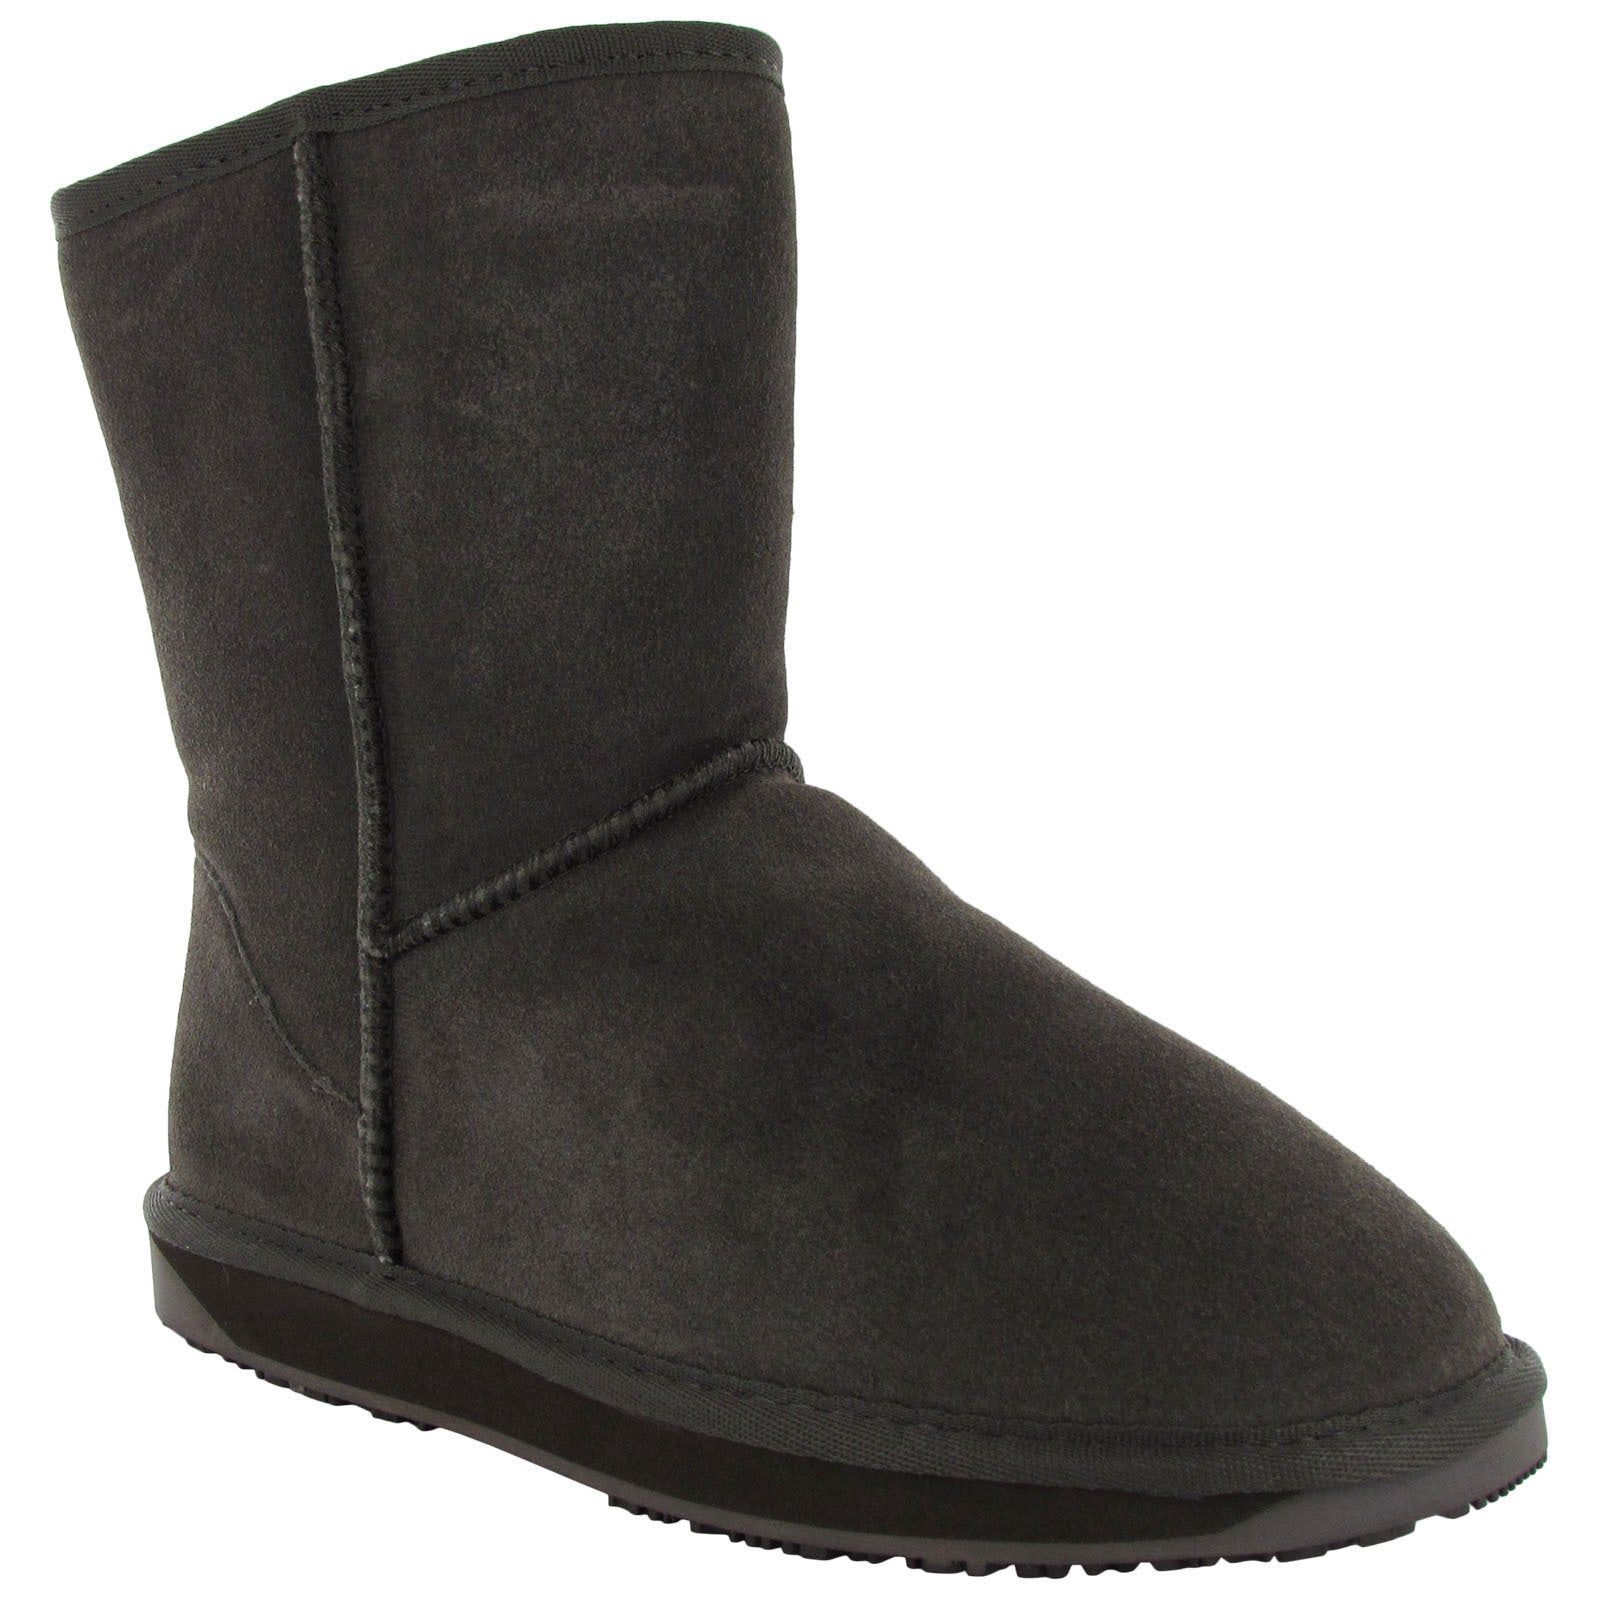 BALENCIAGA Black & Blue Leather Knee-High Boots Heels Shoes EU39 US8.5 75